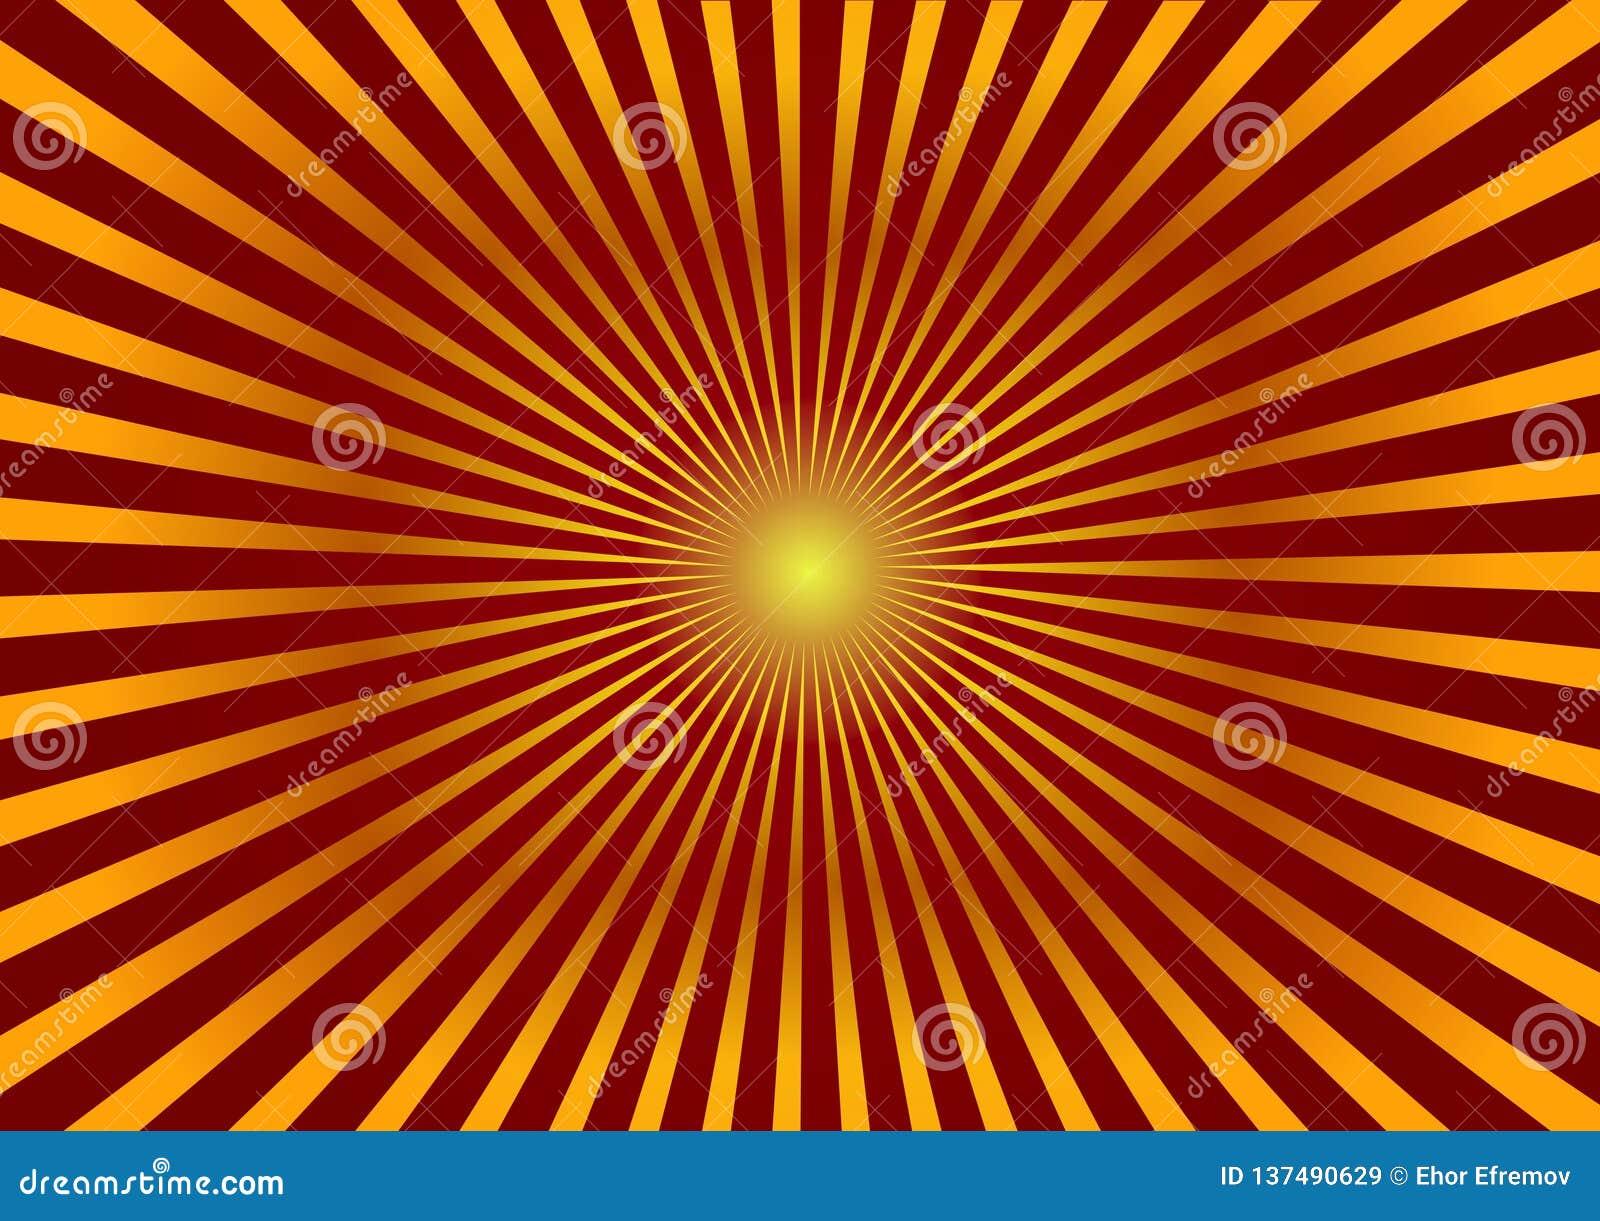 предпосылка яркая Красная предпосылка с золотыми дивергентными лучами